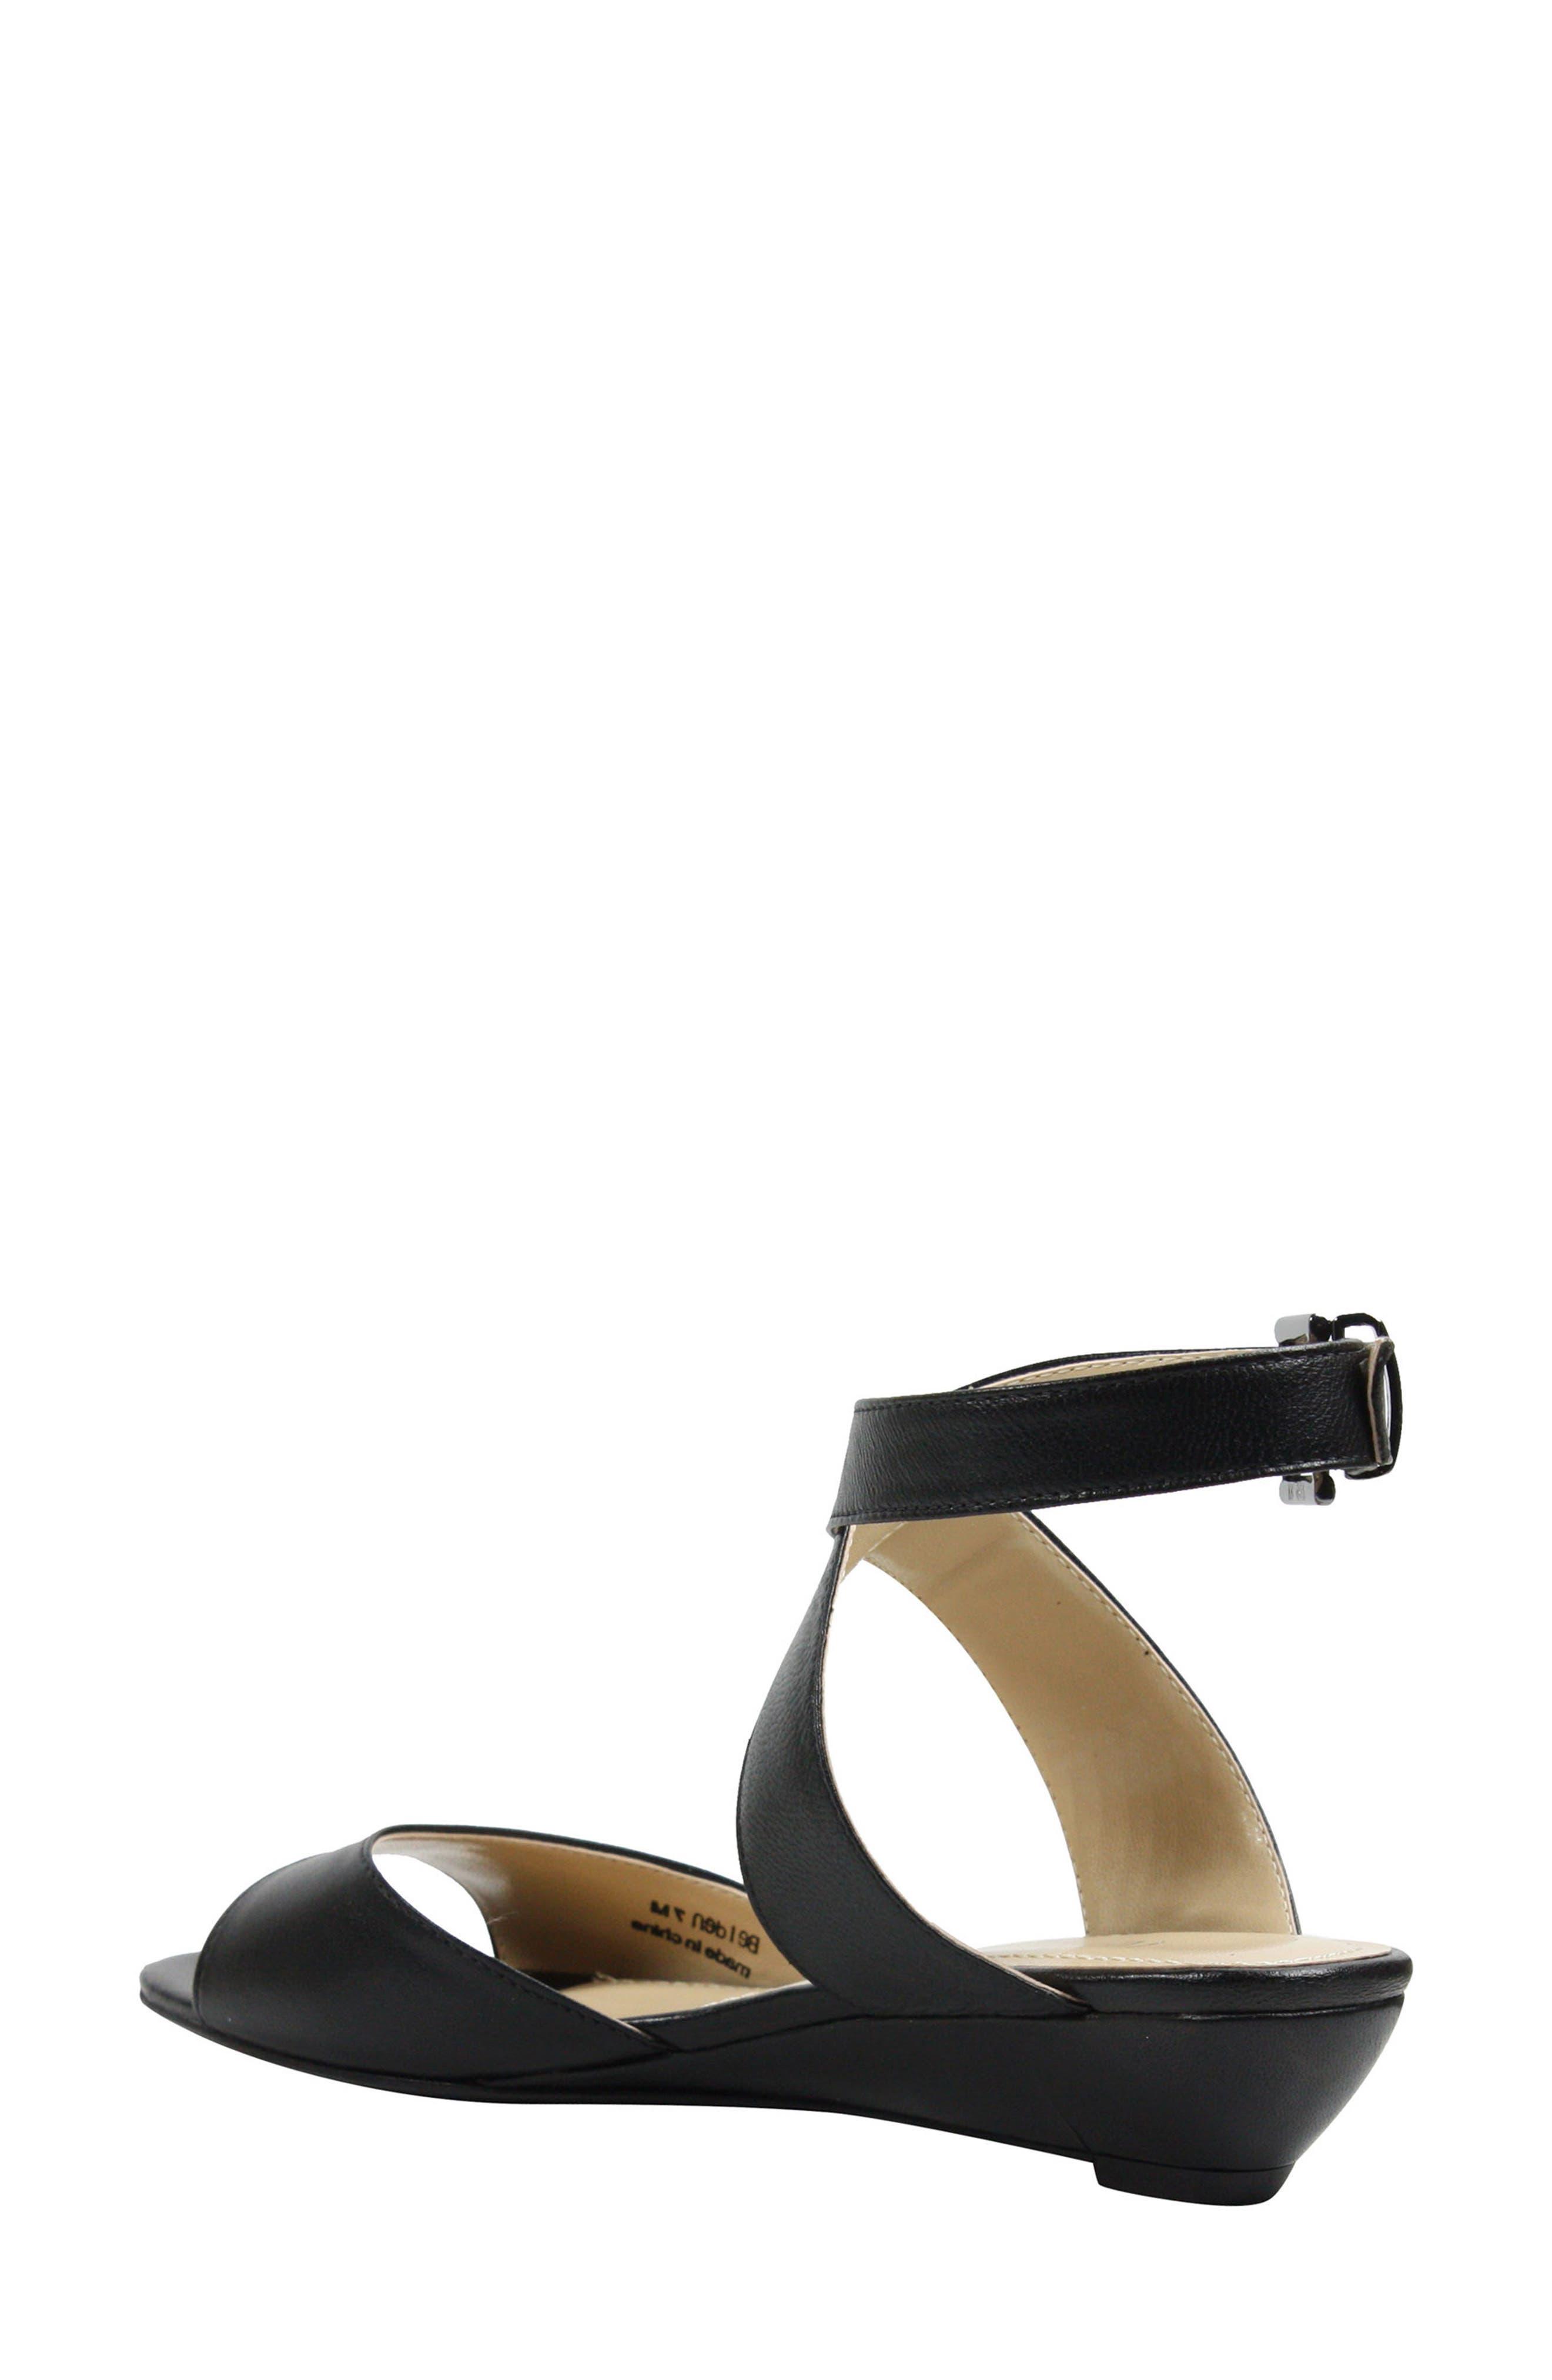 Belden Ankle Wrap Sandal,                             Alternate thumbnail 2, color,                             Black Leather